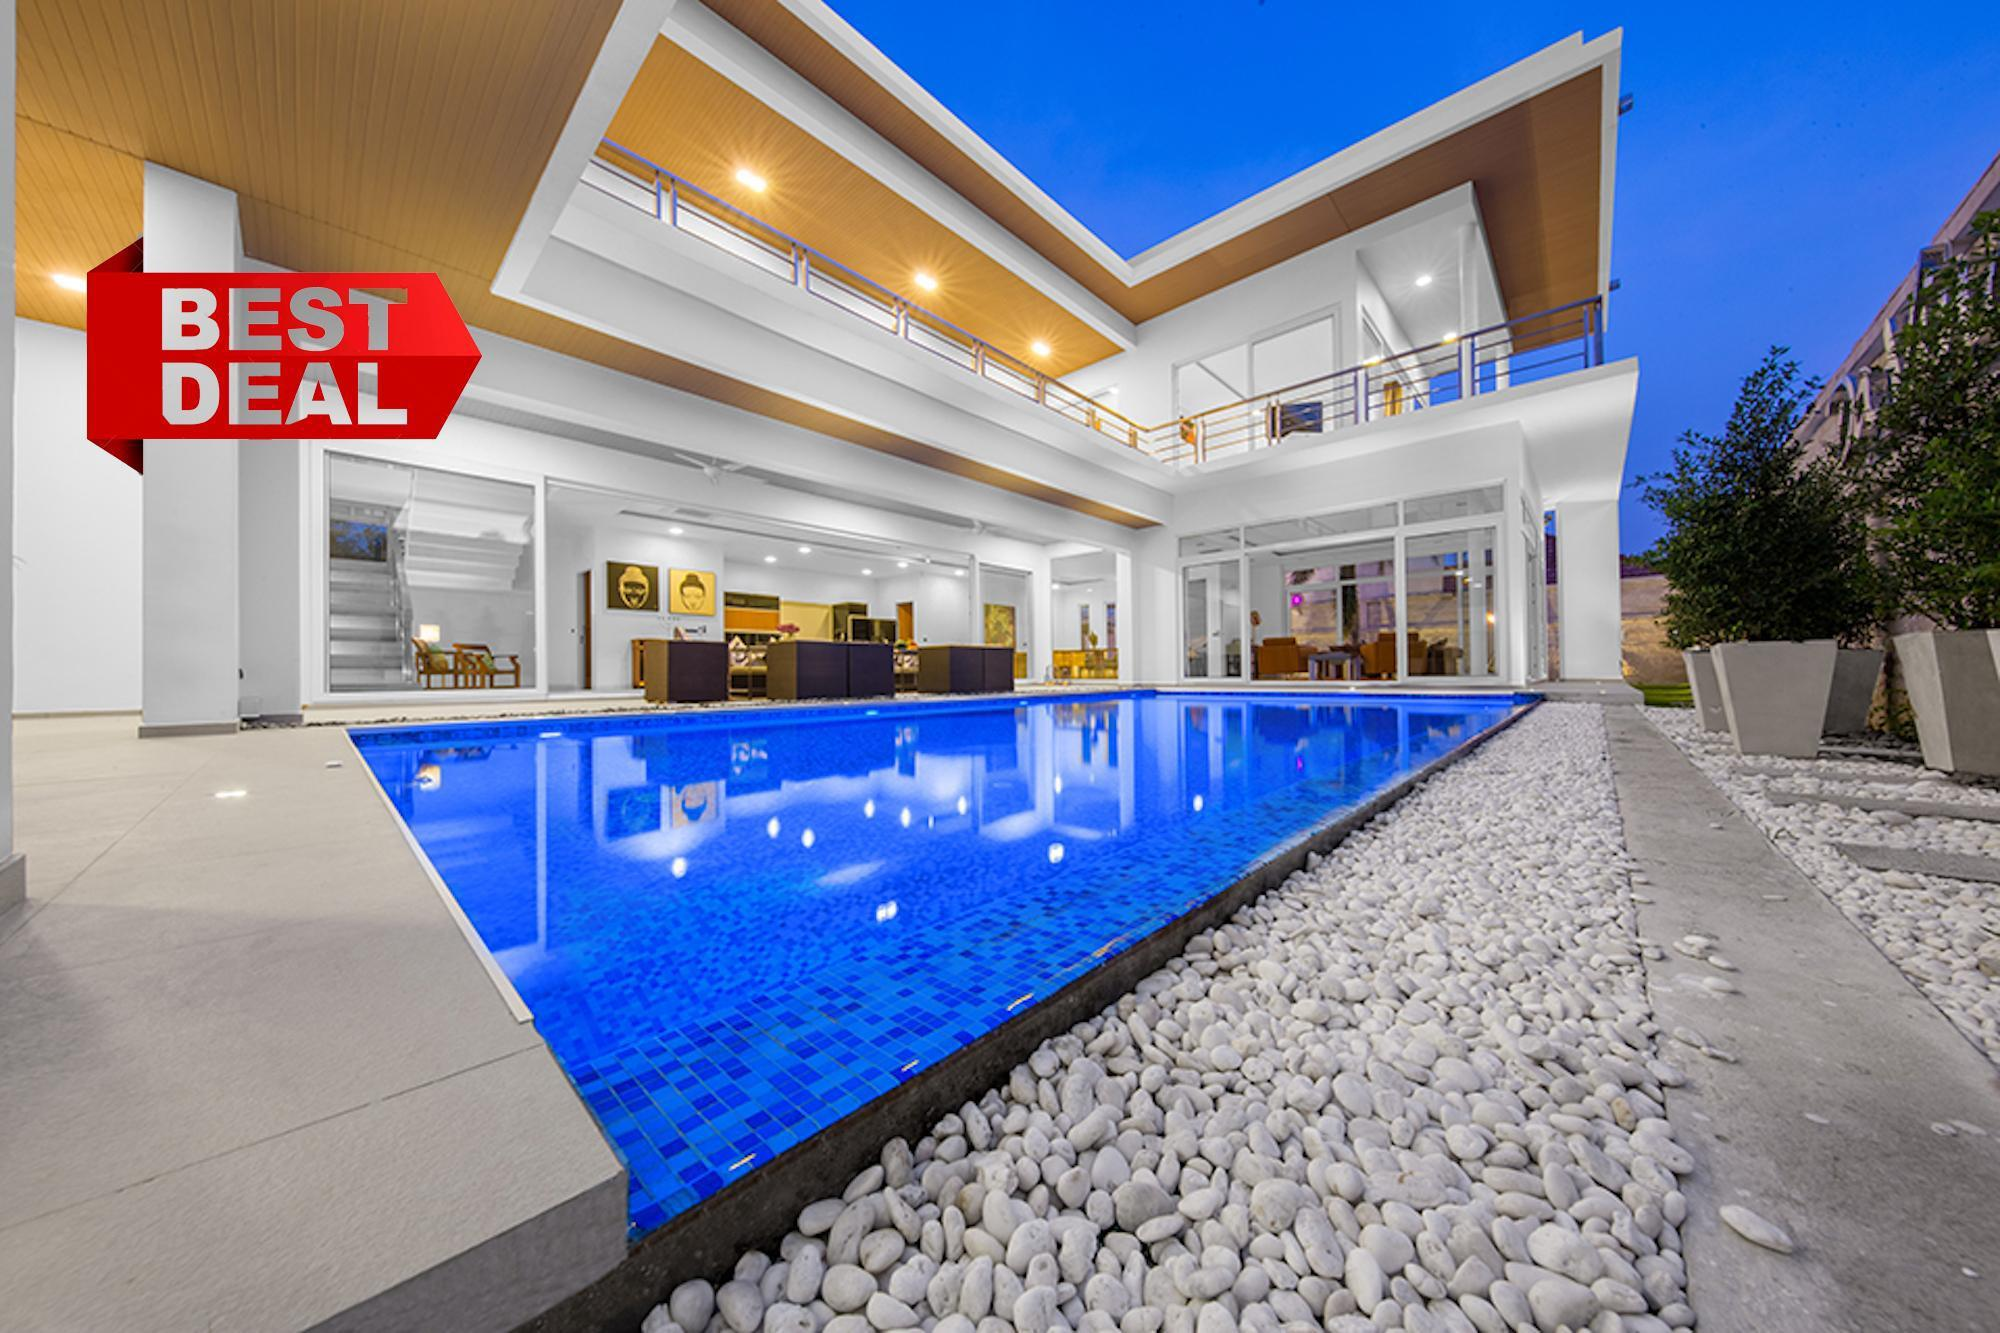 VIP DaVinci Pool Villa Pattaya 7 bedroom 7 ห้องนอน 5 ห้องน้ำส่วนตัว ขนาด 724 ตร.ม. – หาดจอมเทียน